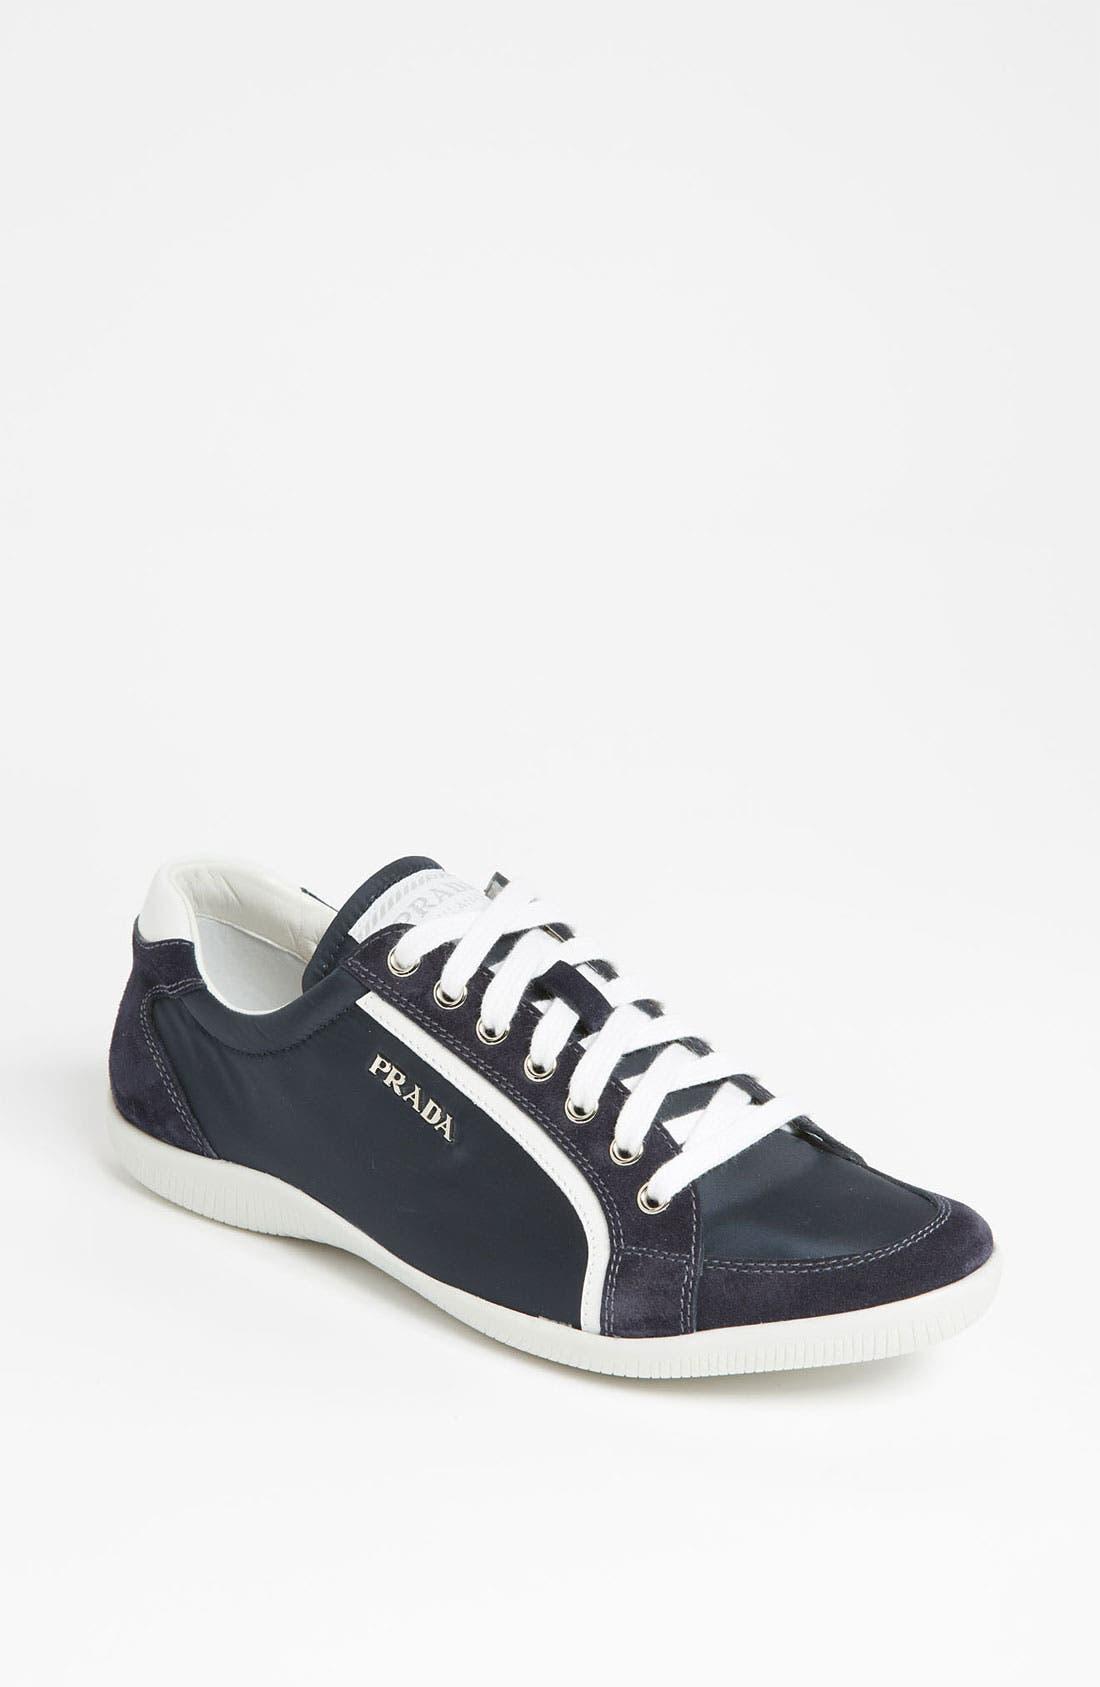 Alternate Image 1 Selected - Prada Nylon Sneaker